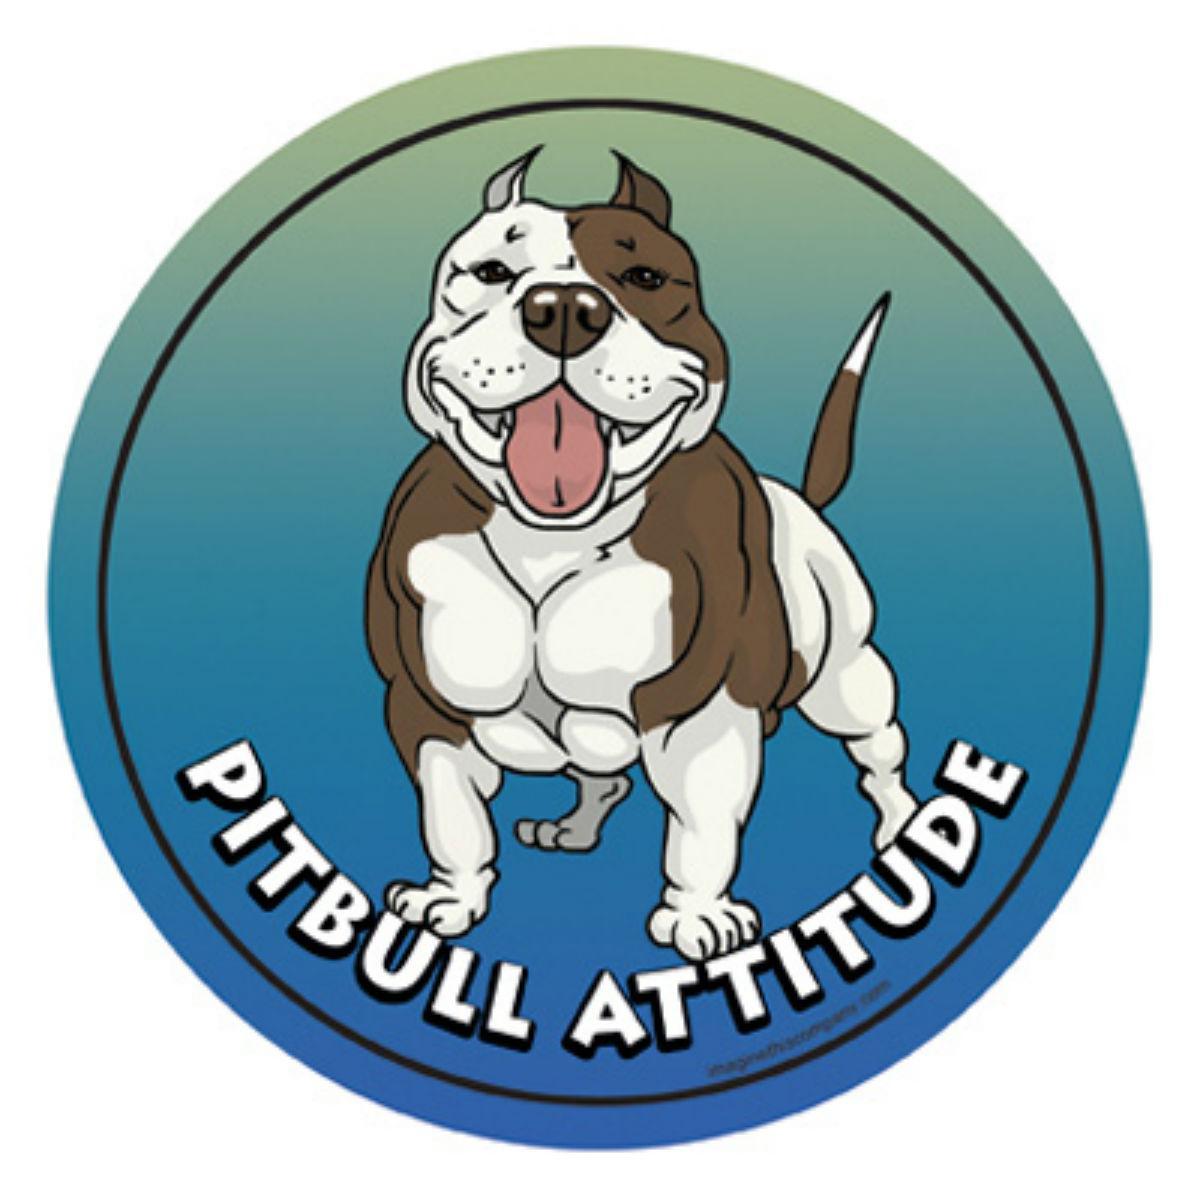 Circle Attitude Magnet Collection - Pitbull